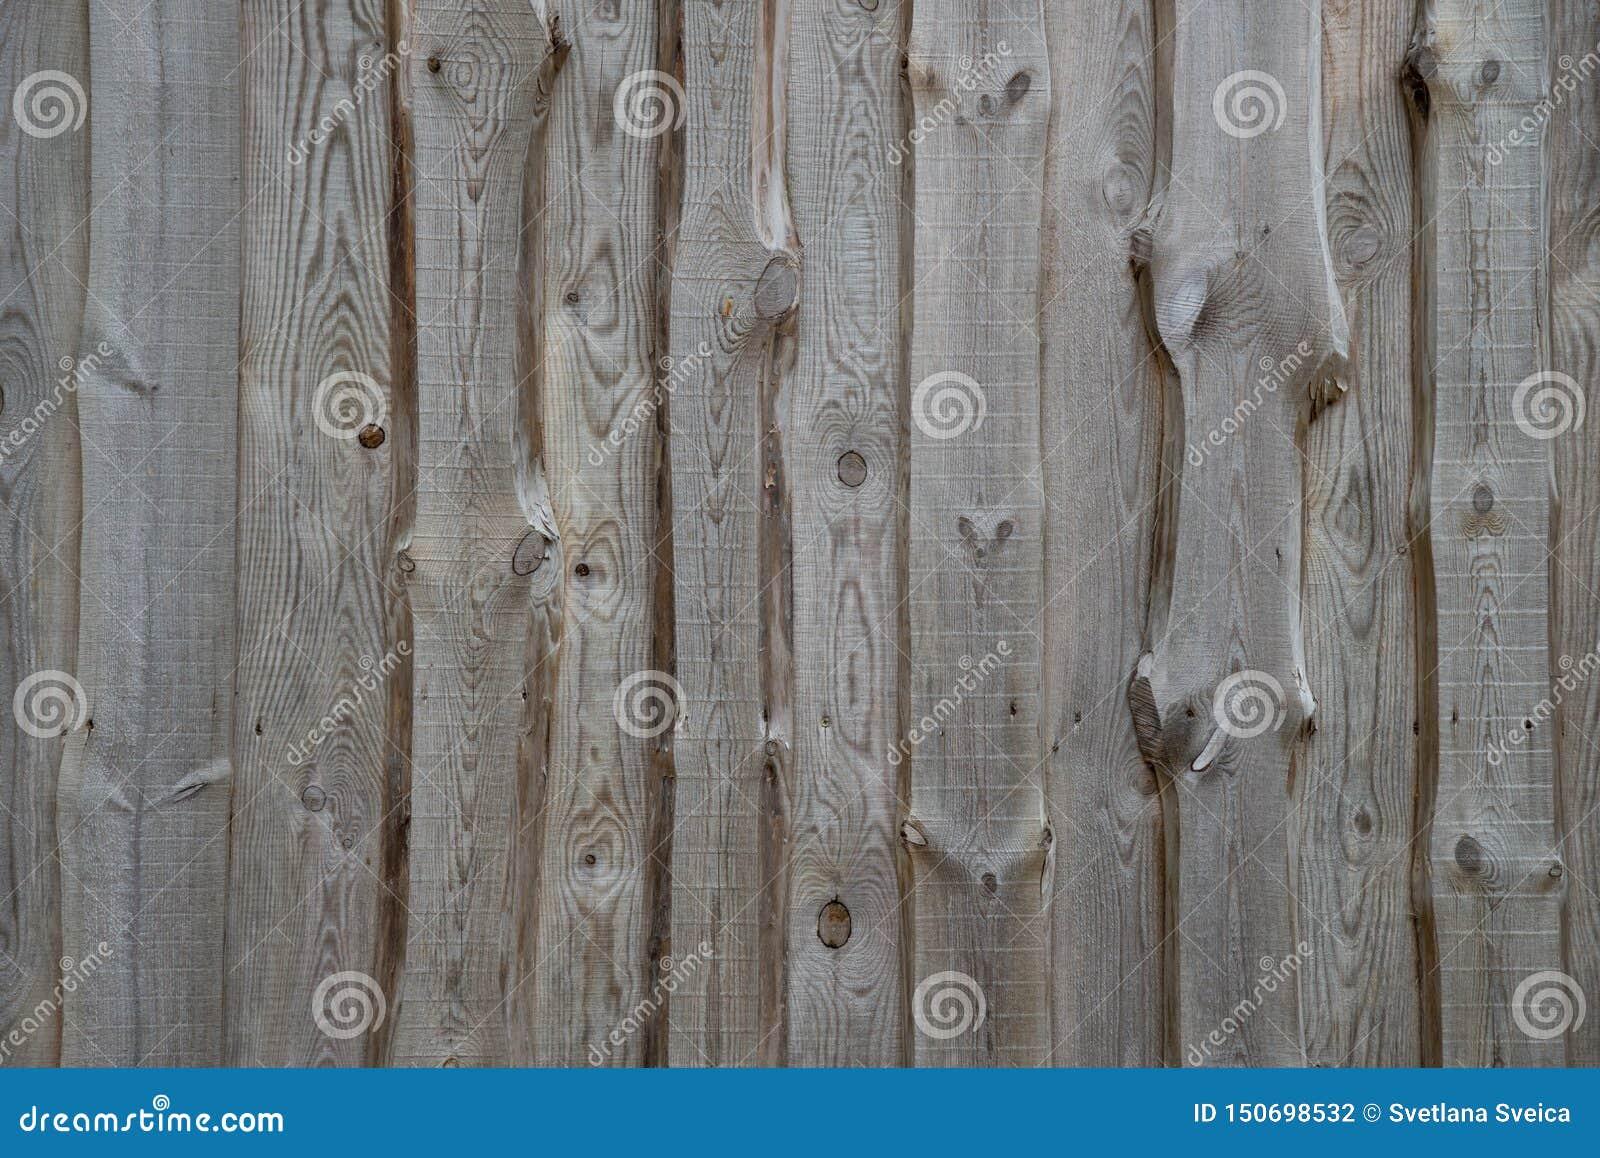 Деревянная текстура части фасада стены